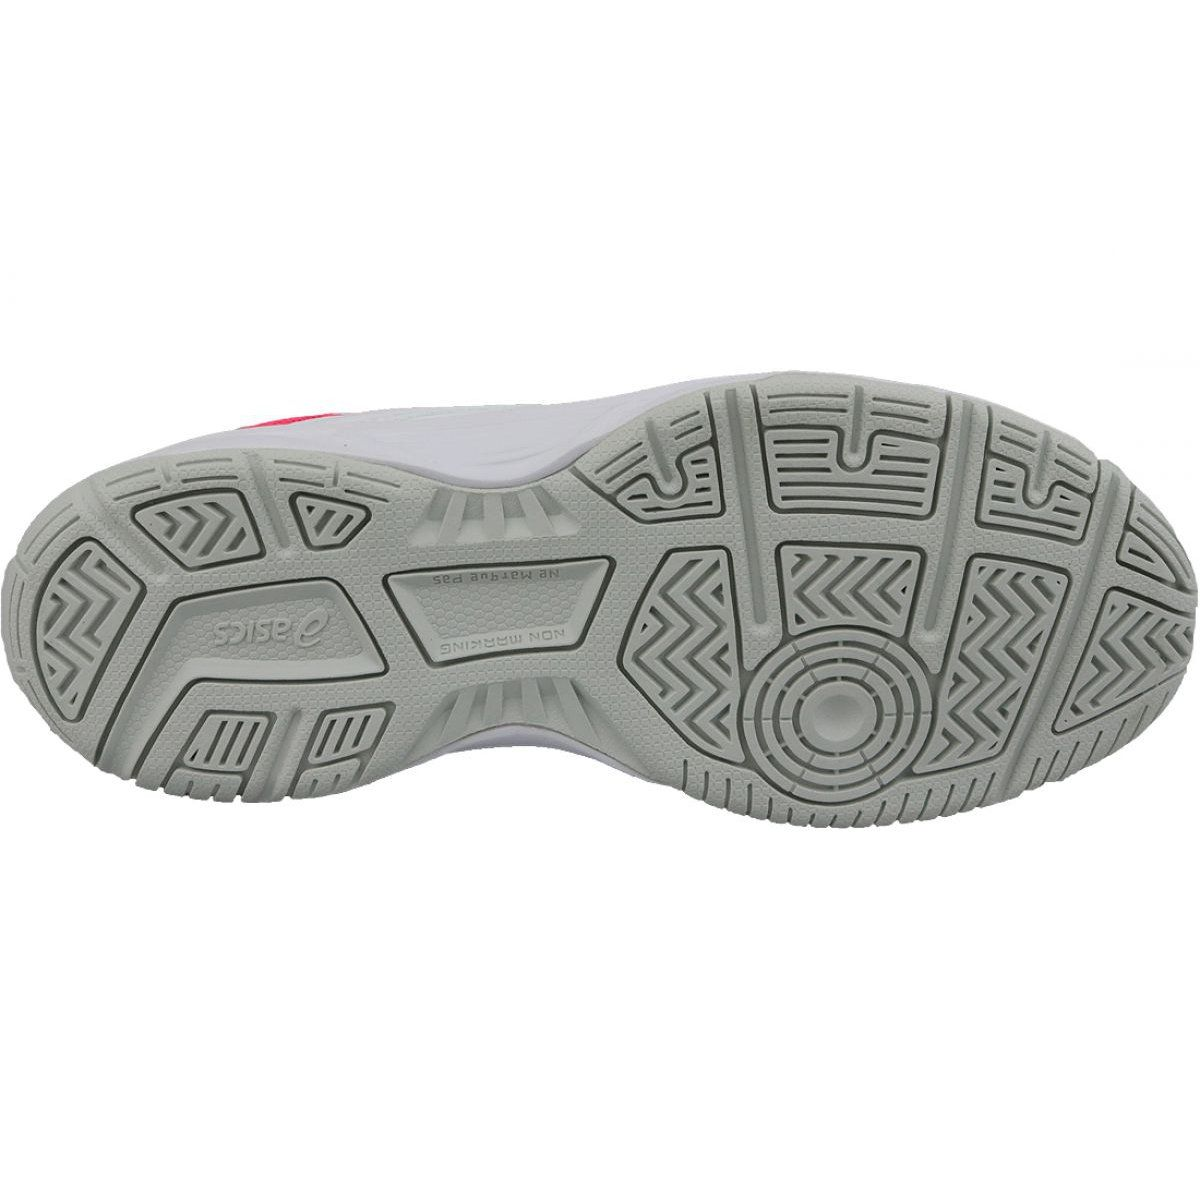 Asics Court Slide W 1042a030 101 Tennis Shoes White Asics Asics Women Tennis